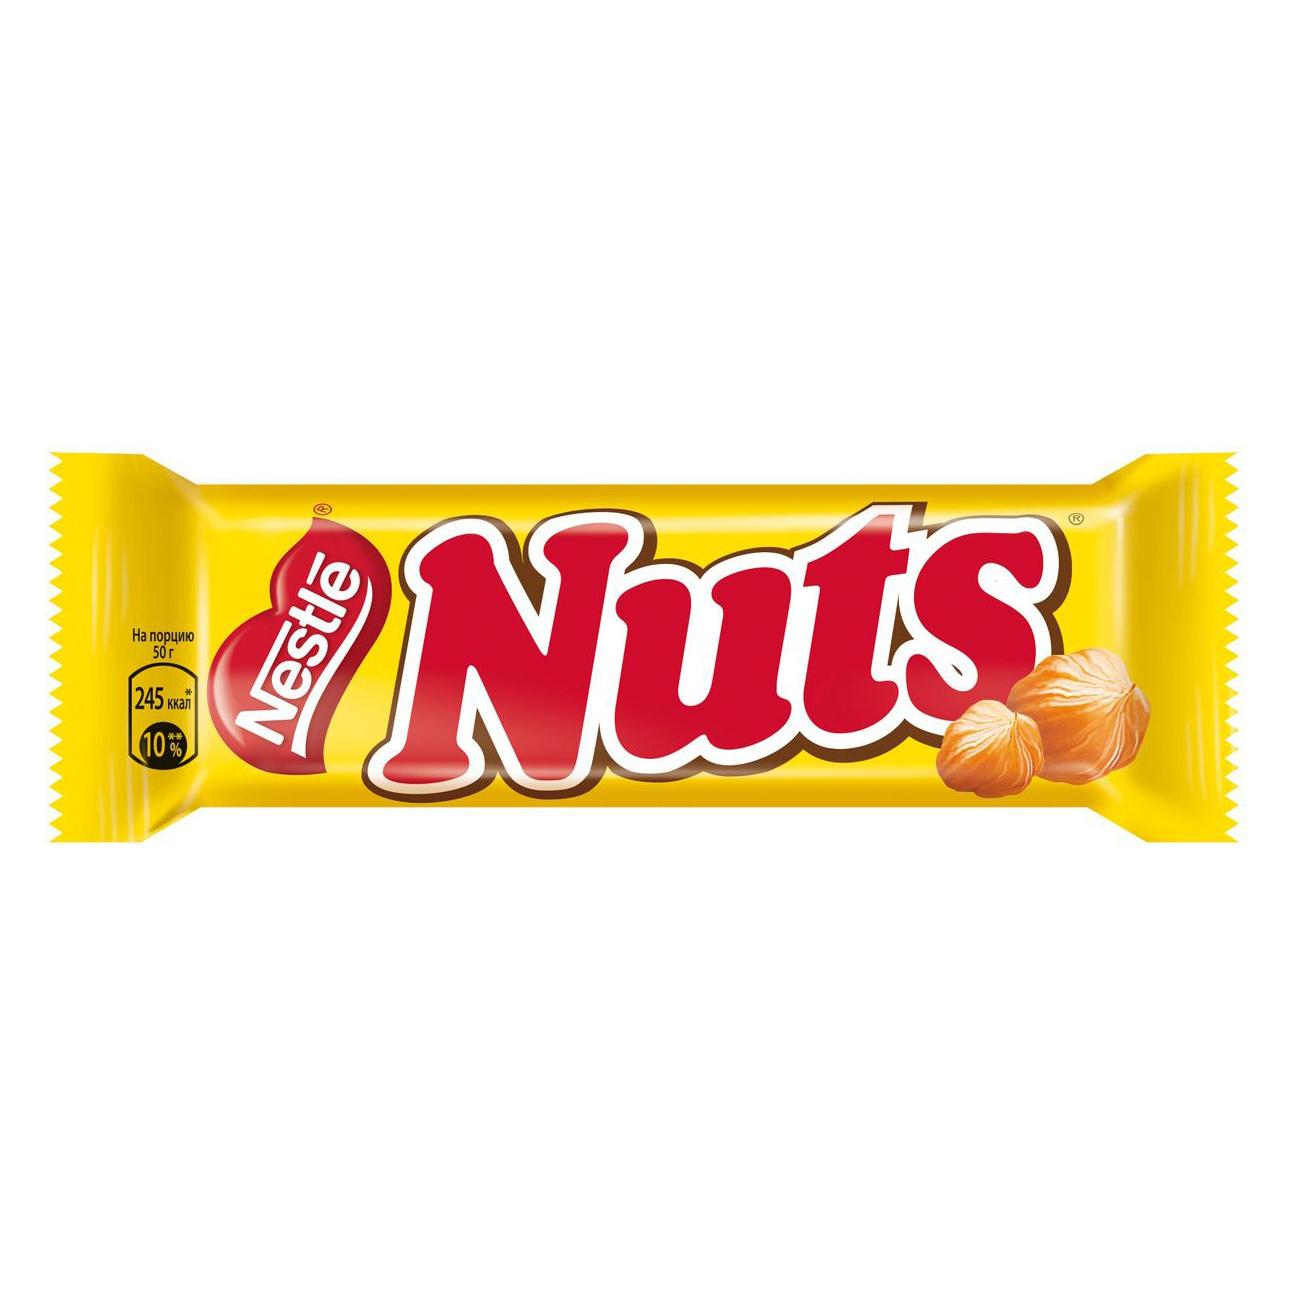 Фото - Шоколадный батончик Nuts 50 г шоколадный баточник nuts с орехами 50 г